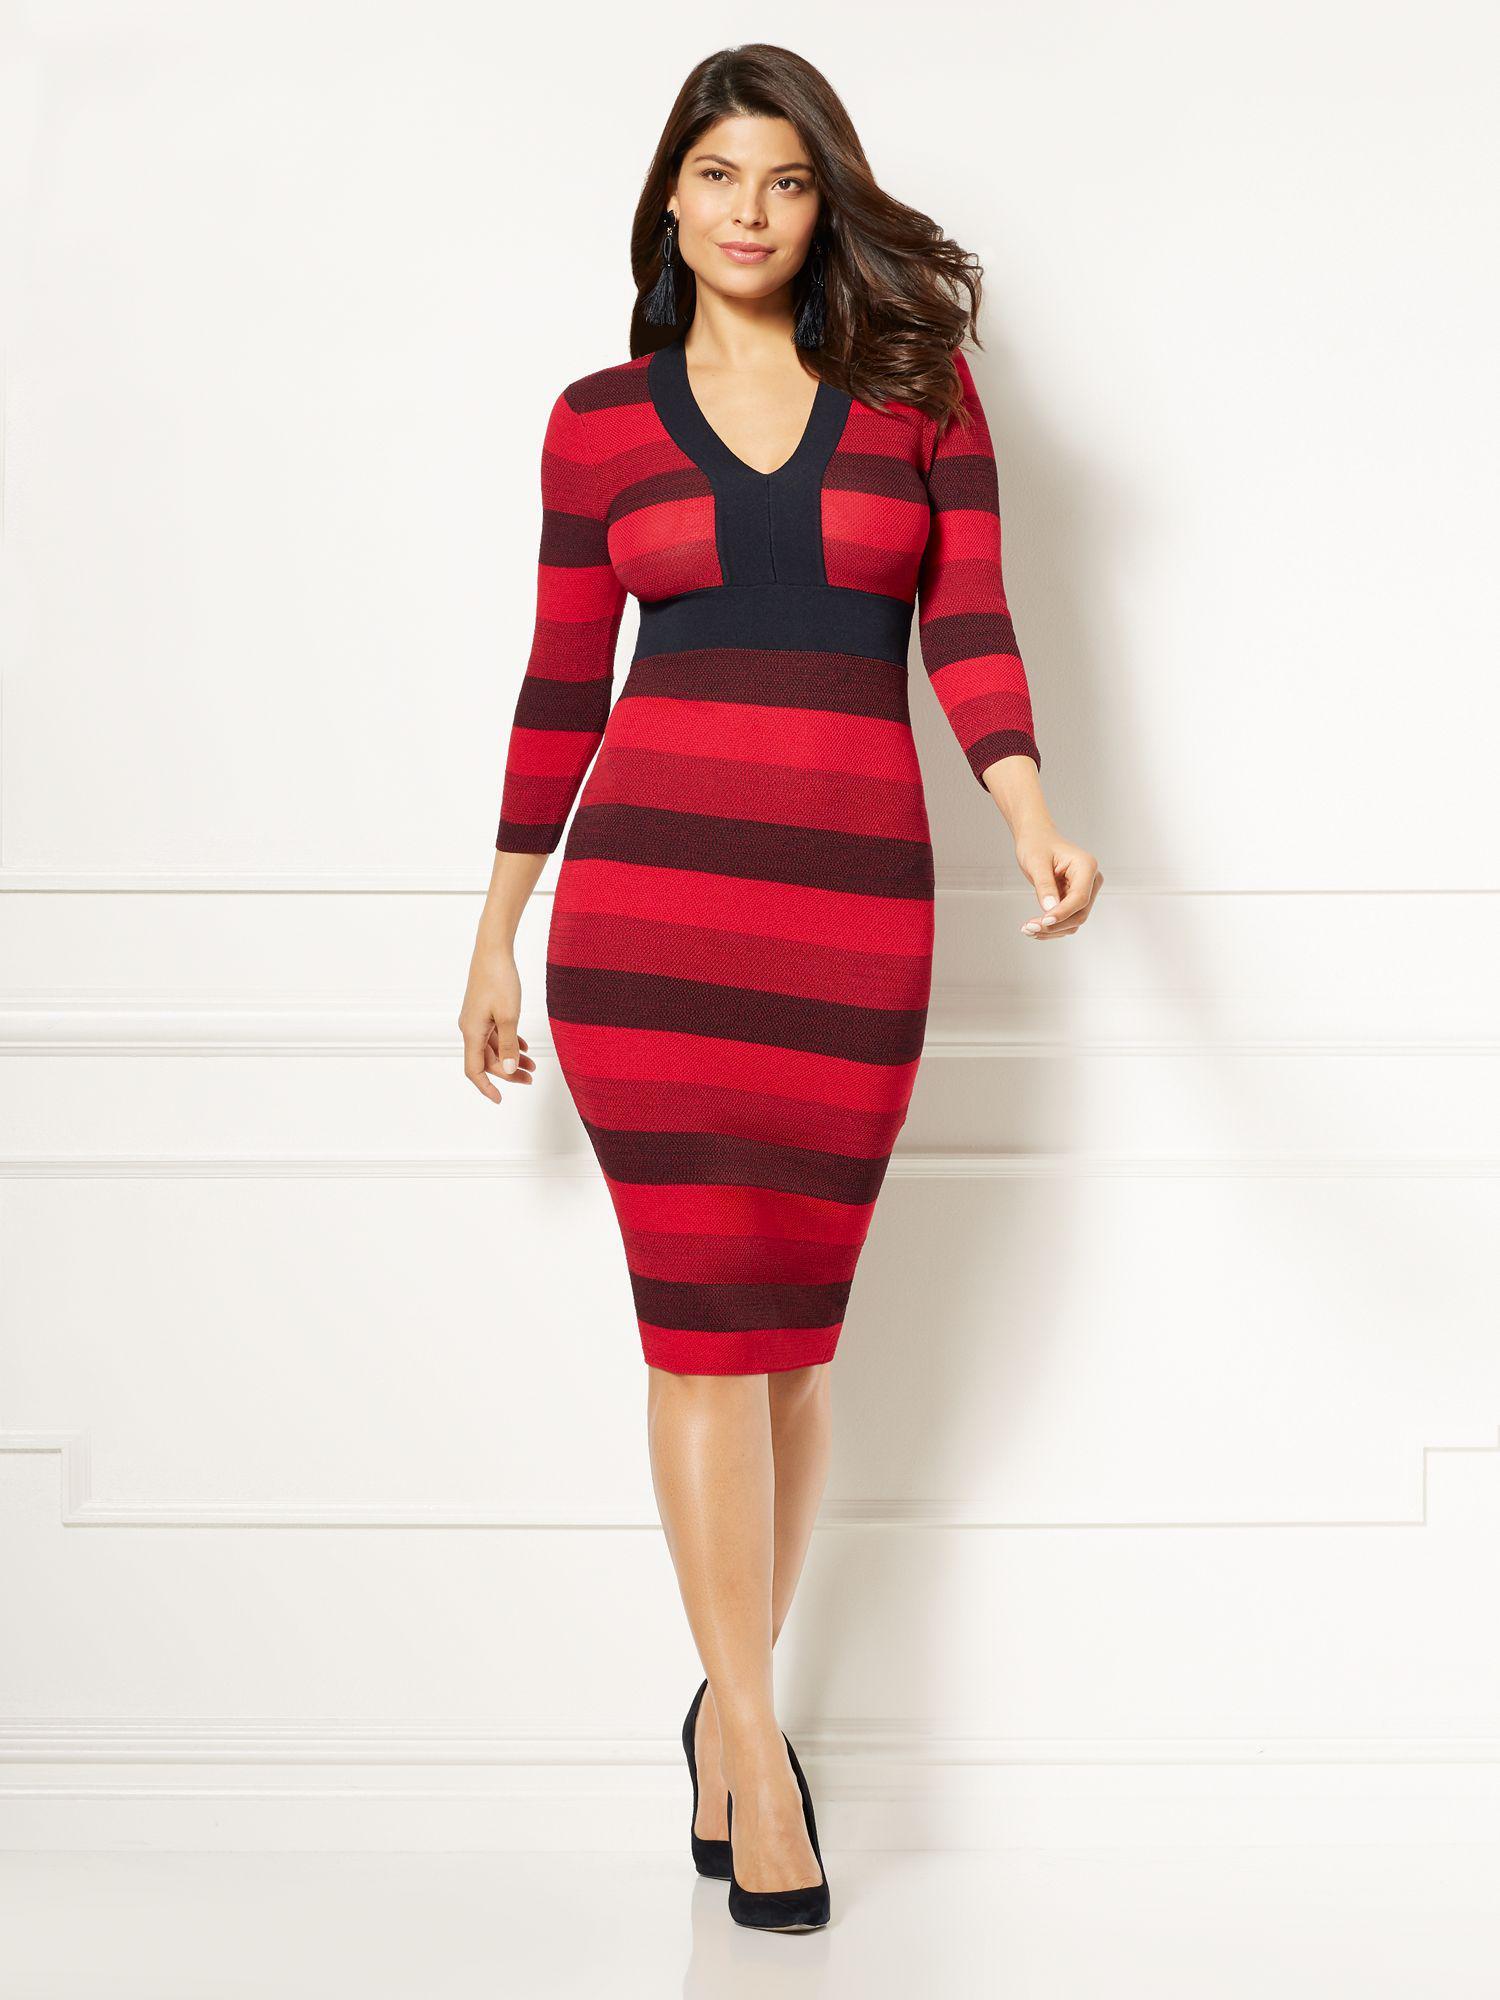 dcd8916868b New York   Company Eva Mendes Collection - Francisca Stripe Sweater ...